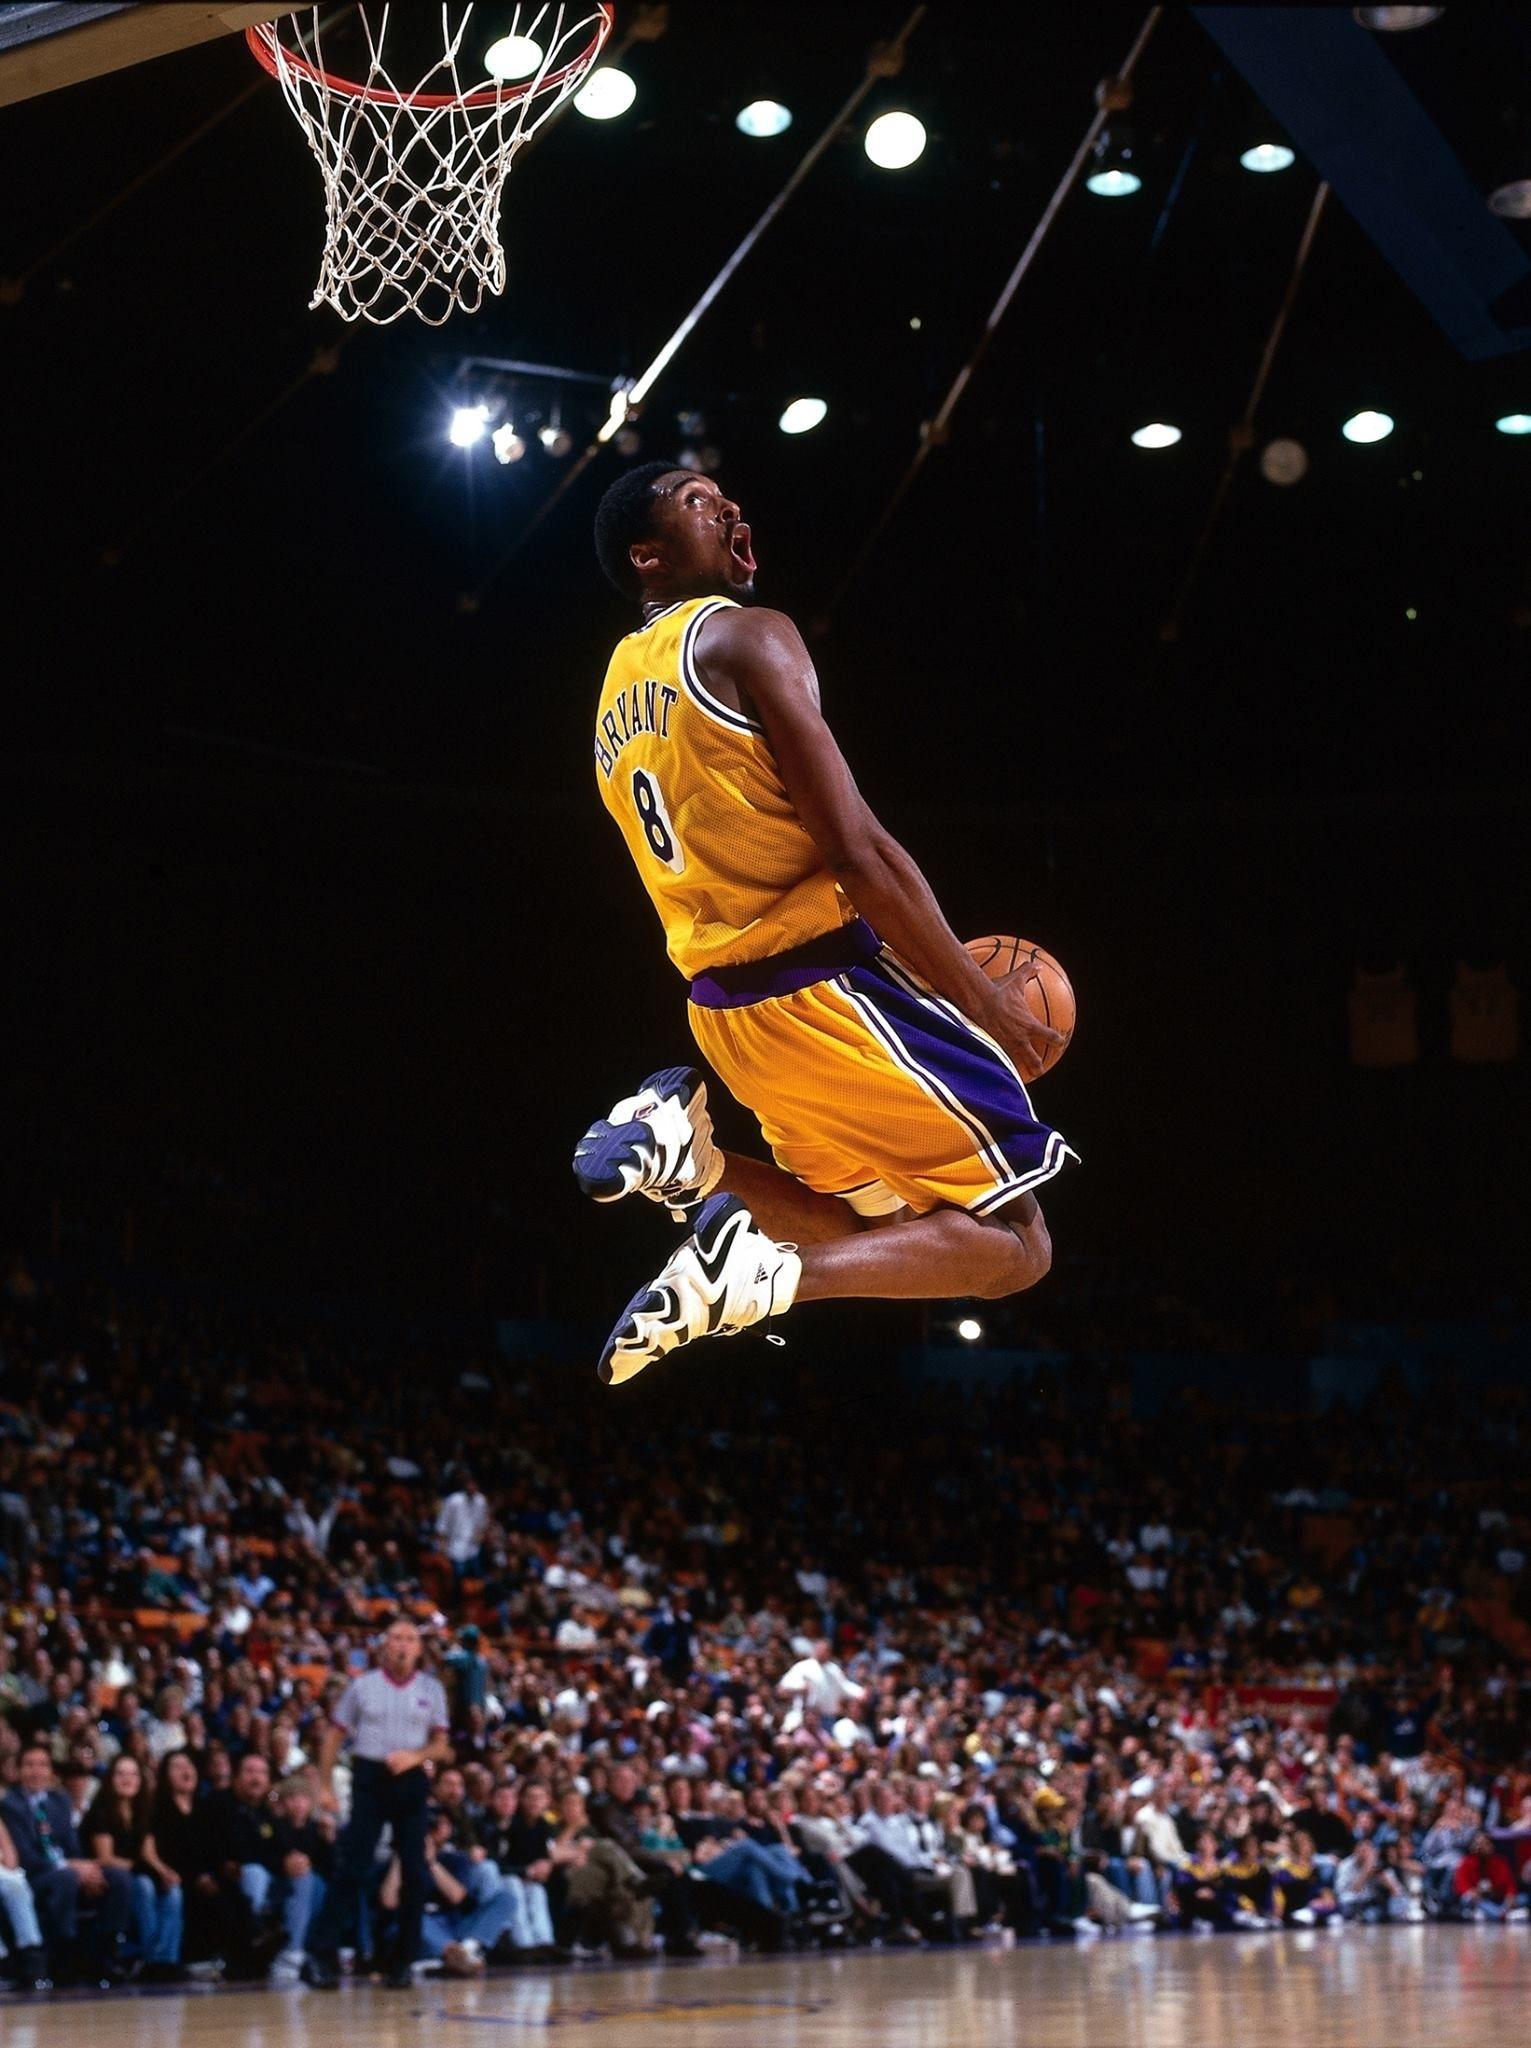 Basketball Player Kobe Bryant Wallpapers Wallpaper Cave